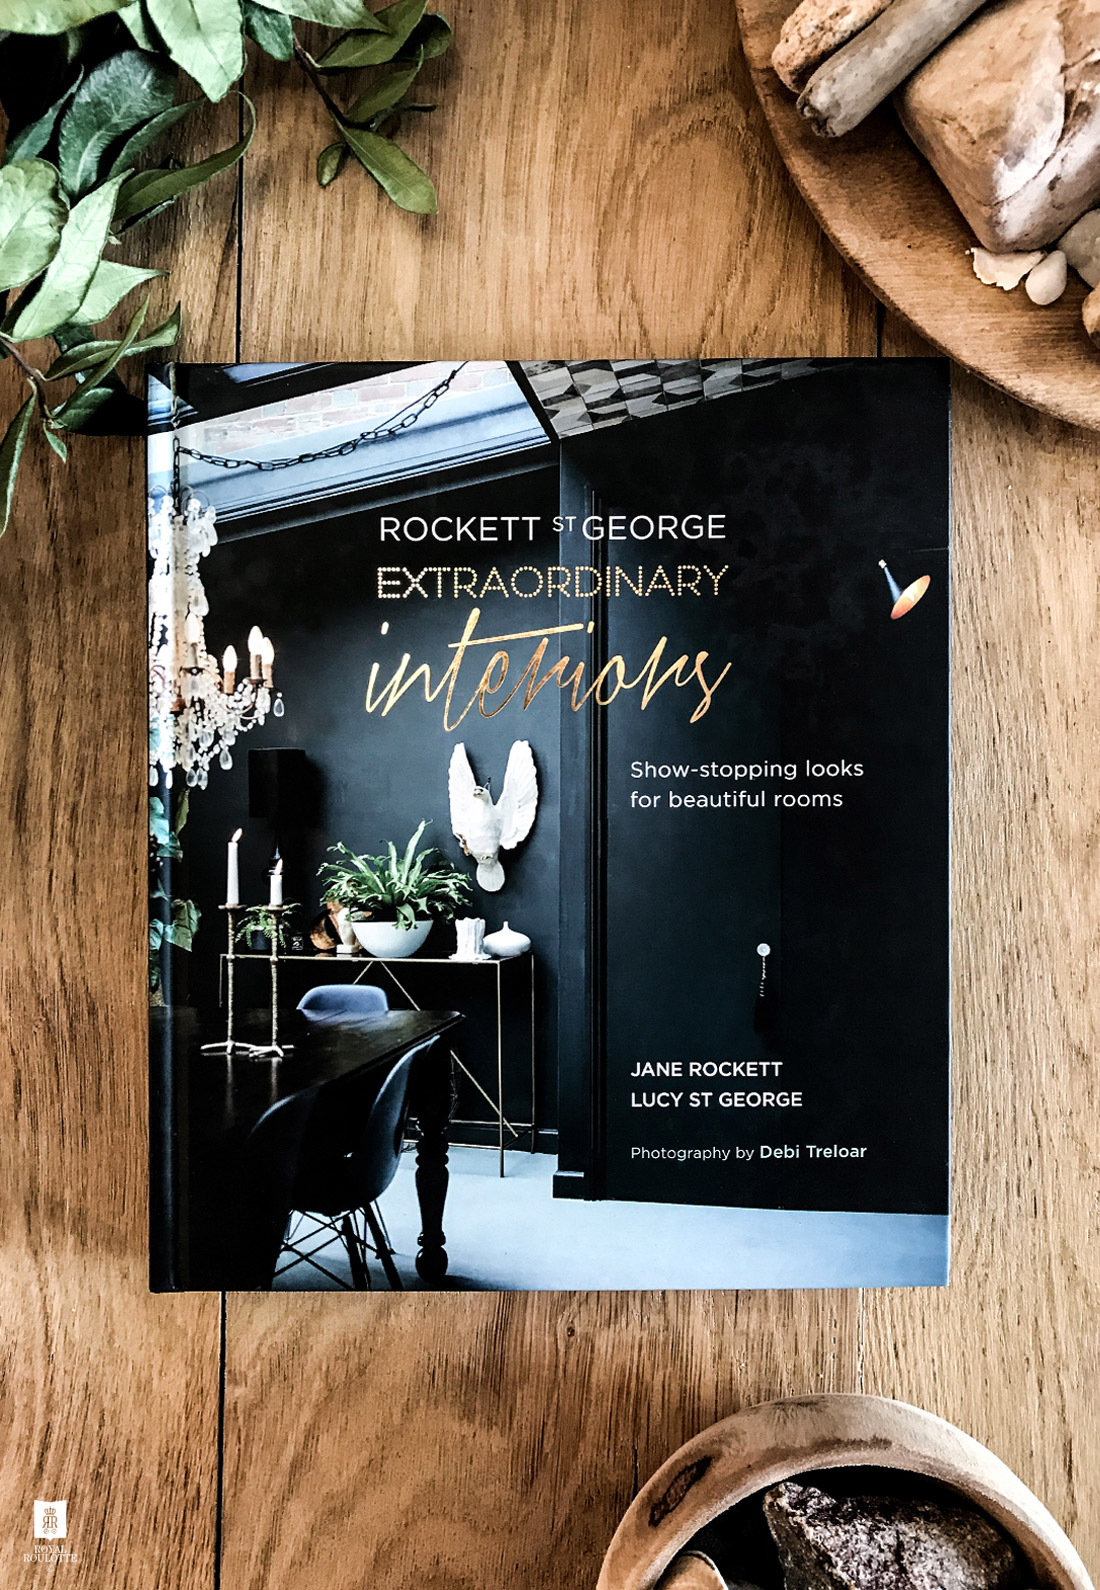 ROYAL_ROULOTTE_LIVRE_ROCKETT_ST_GEORGE_BOOK_EXTRAORDINARY_INTERIORS_01D_BD